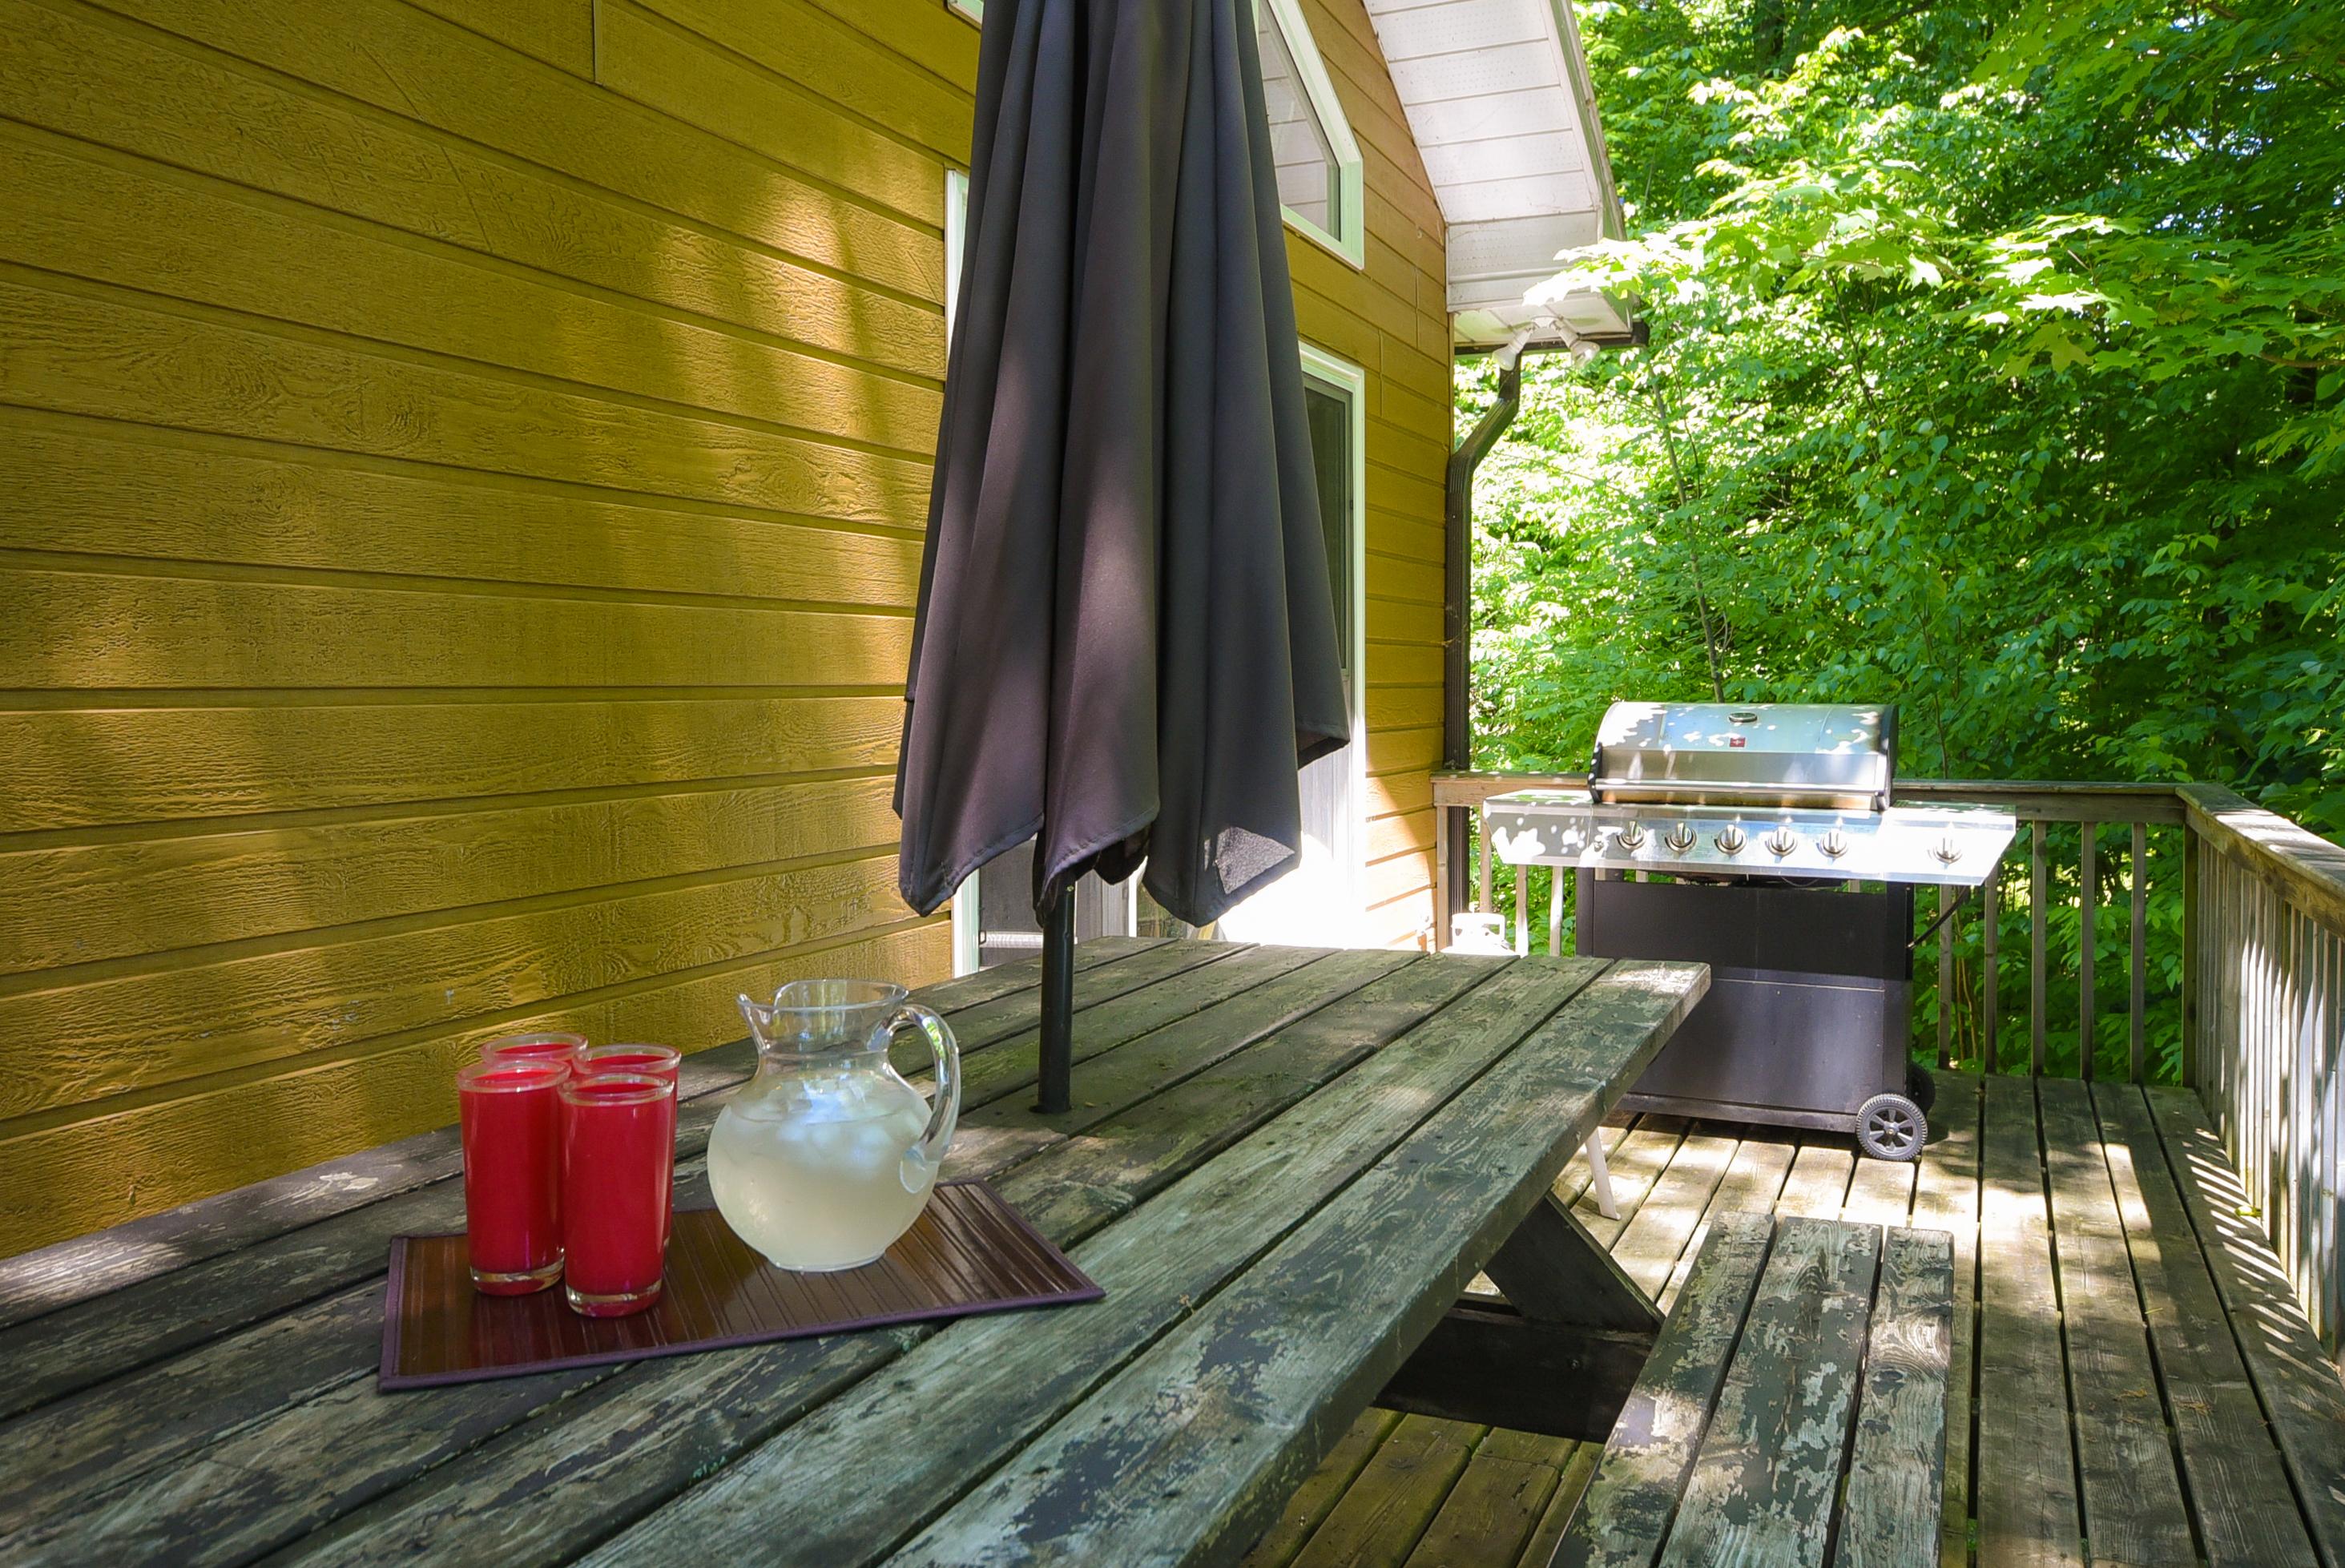 14 ch des cedres,Northfield,Canada,3 Bedrooms Bedrooms,2 BathroomsBathrooms,Cottage,Flower Moon Cottage,ch des cedres,1001